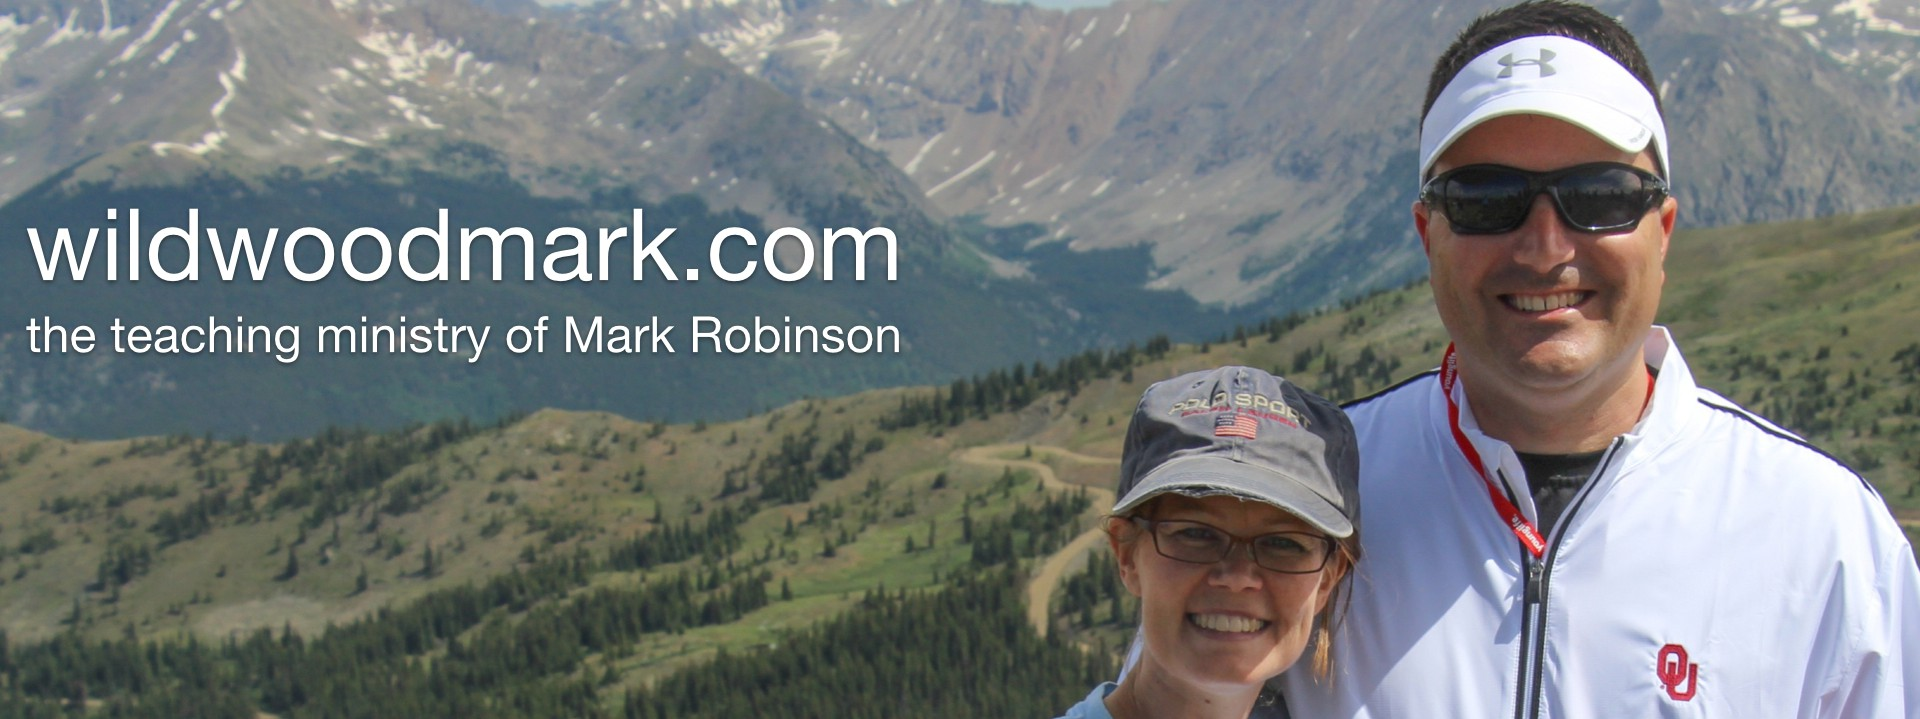 wildwoodmark.com